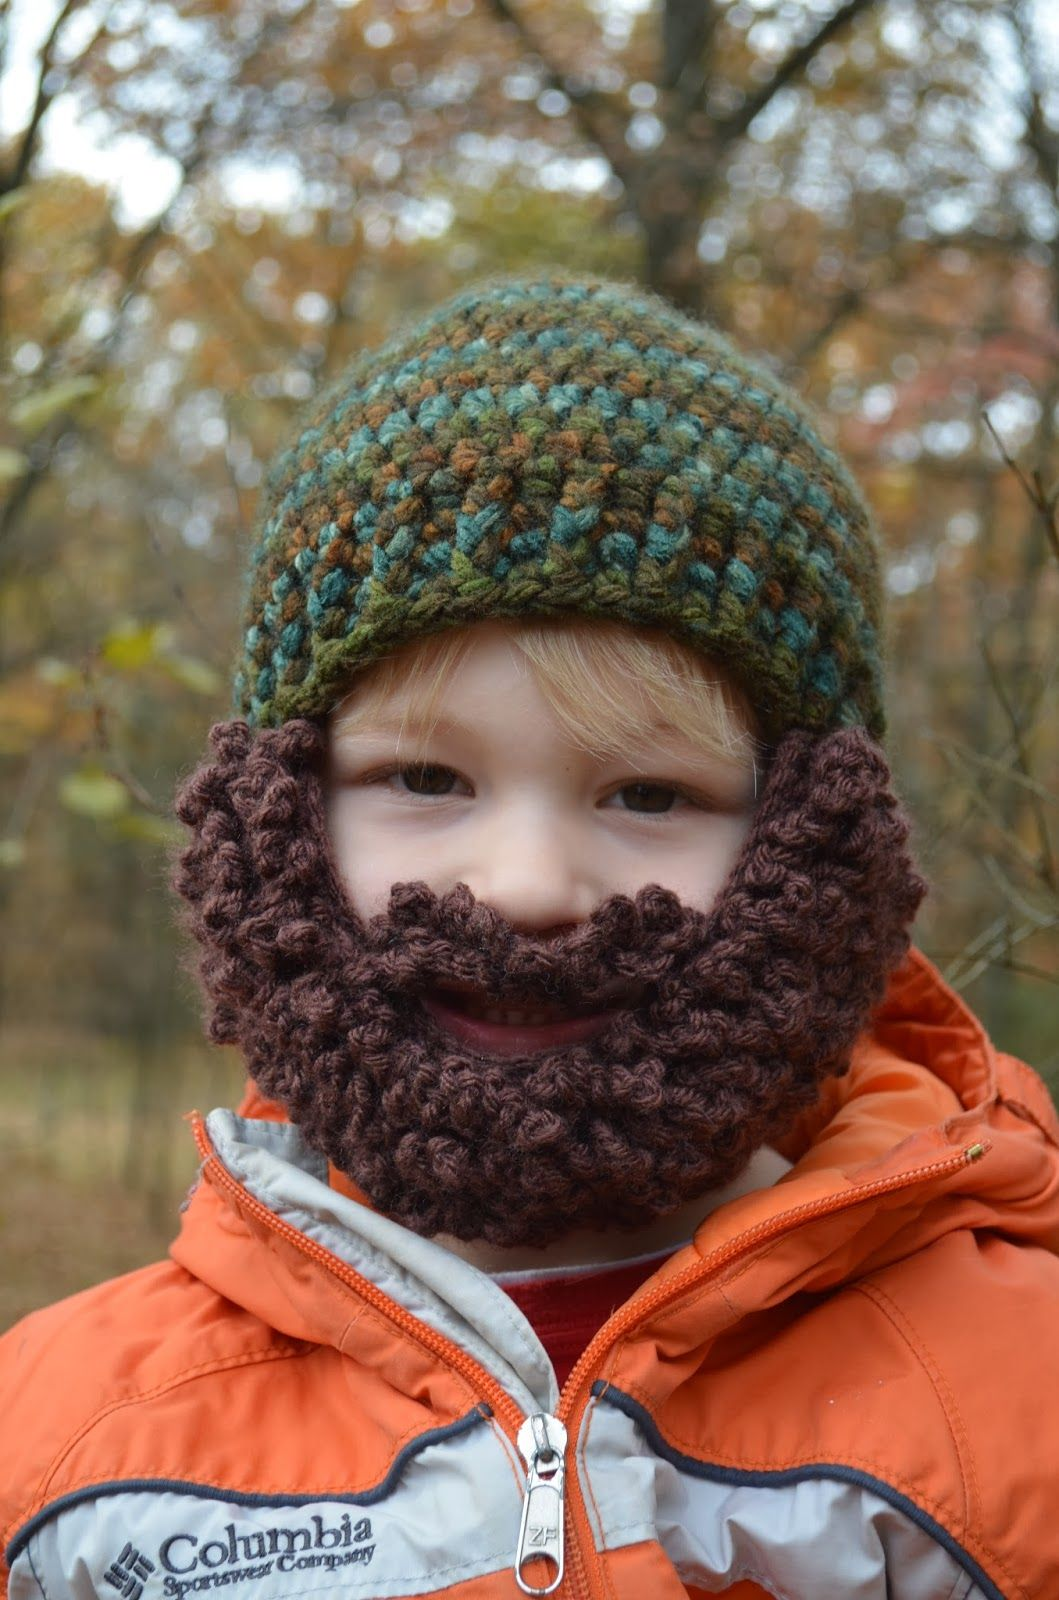 Hand Me Down Hobby: Mountain Man Beard Hat | Crochet hat patterns ...